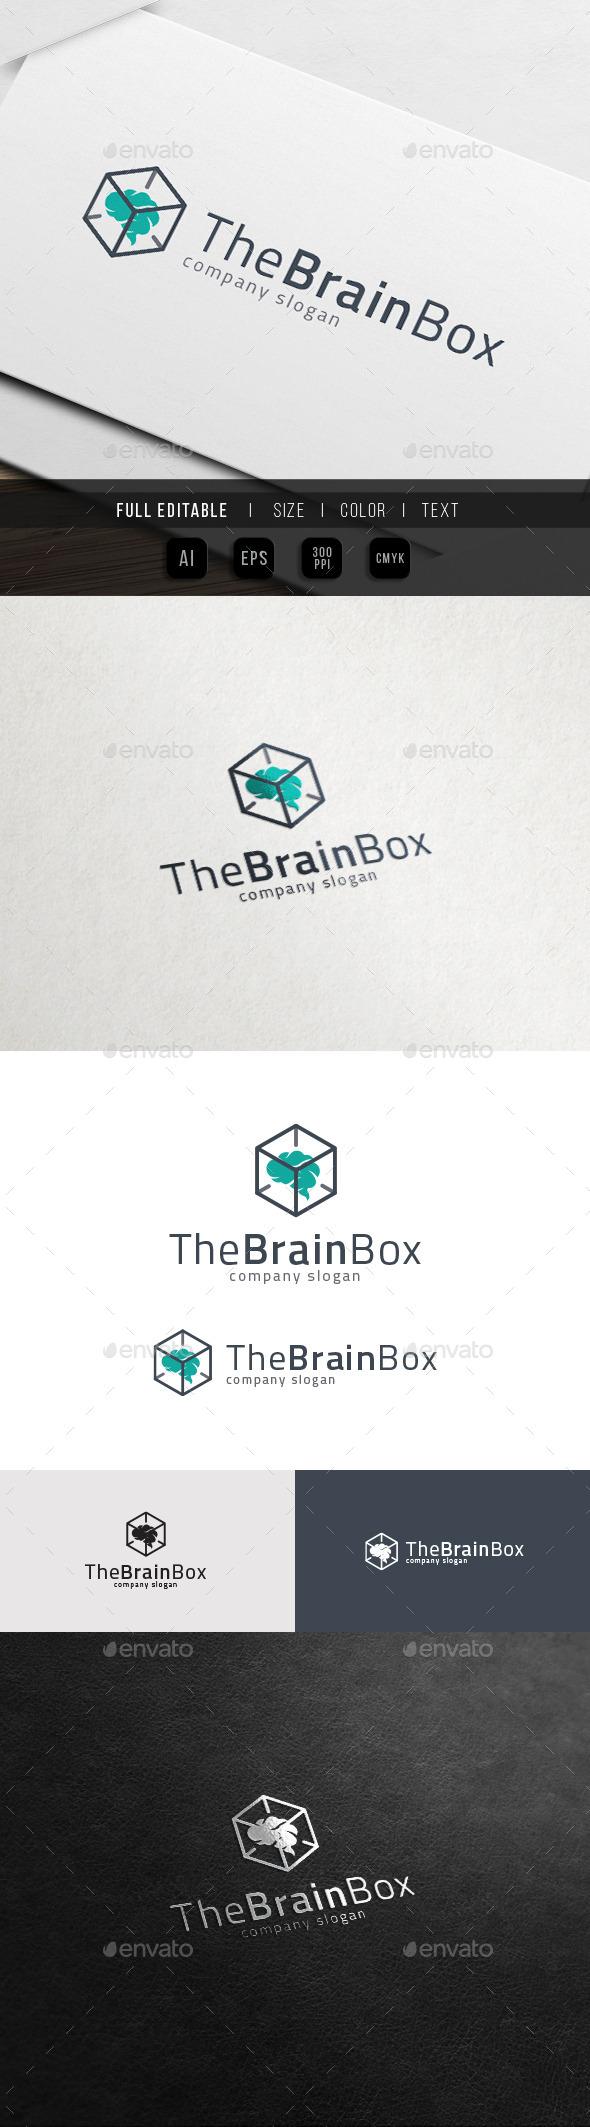 Brain Box - Idea Solution Logo - Abstract Logo Templates